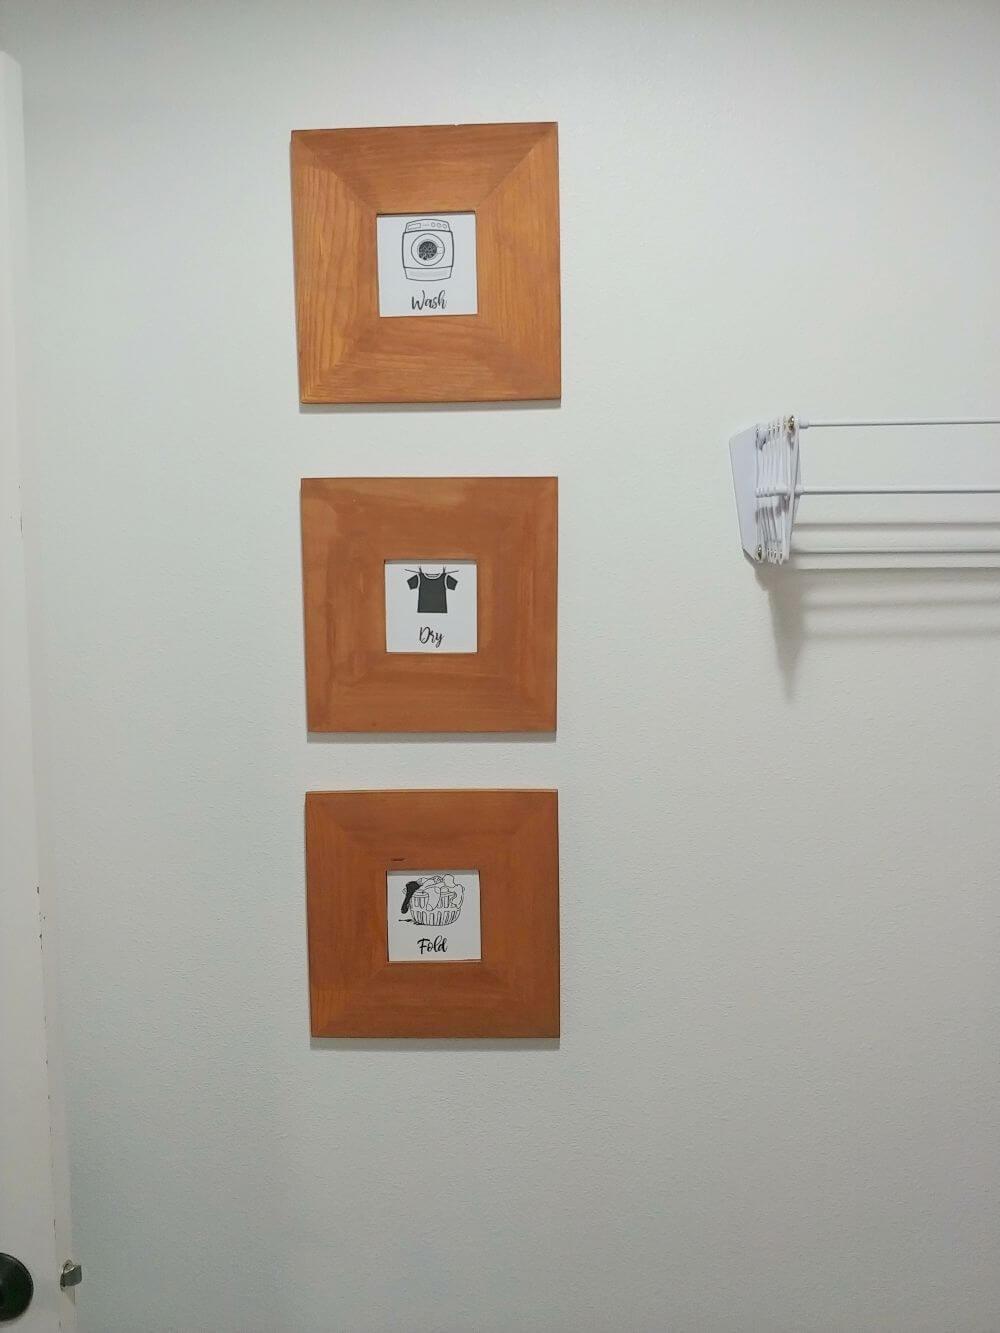 Laundry Room Art with Repurposed IKEA Mirrors